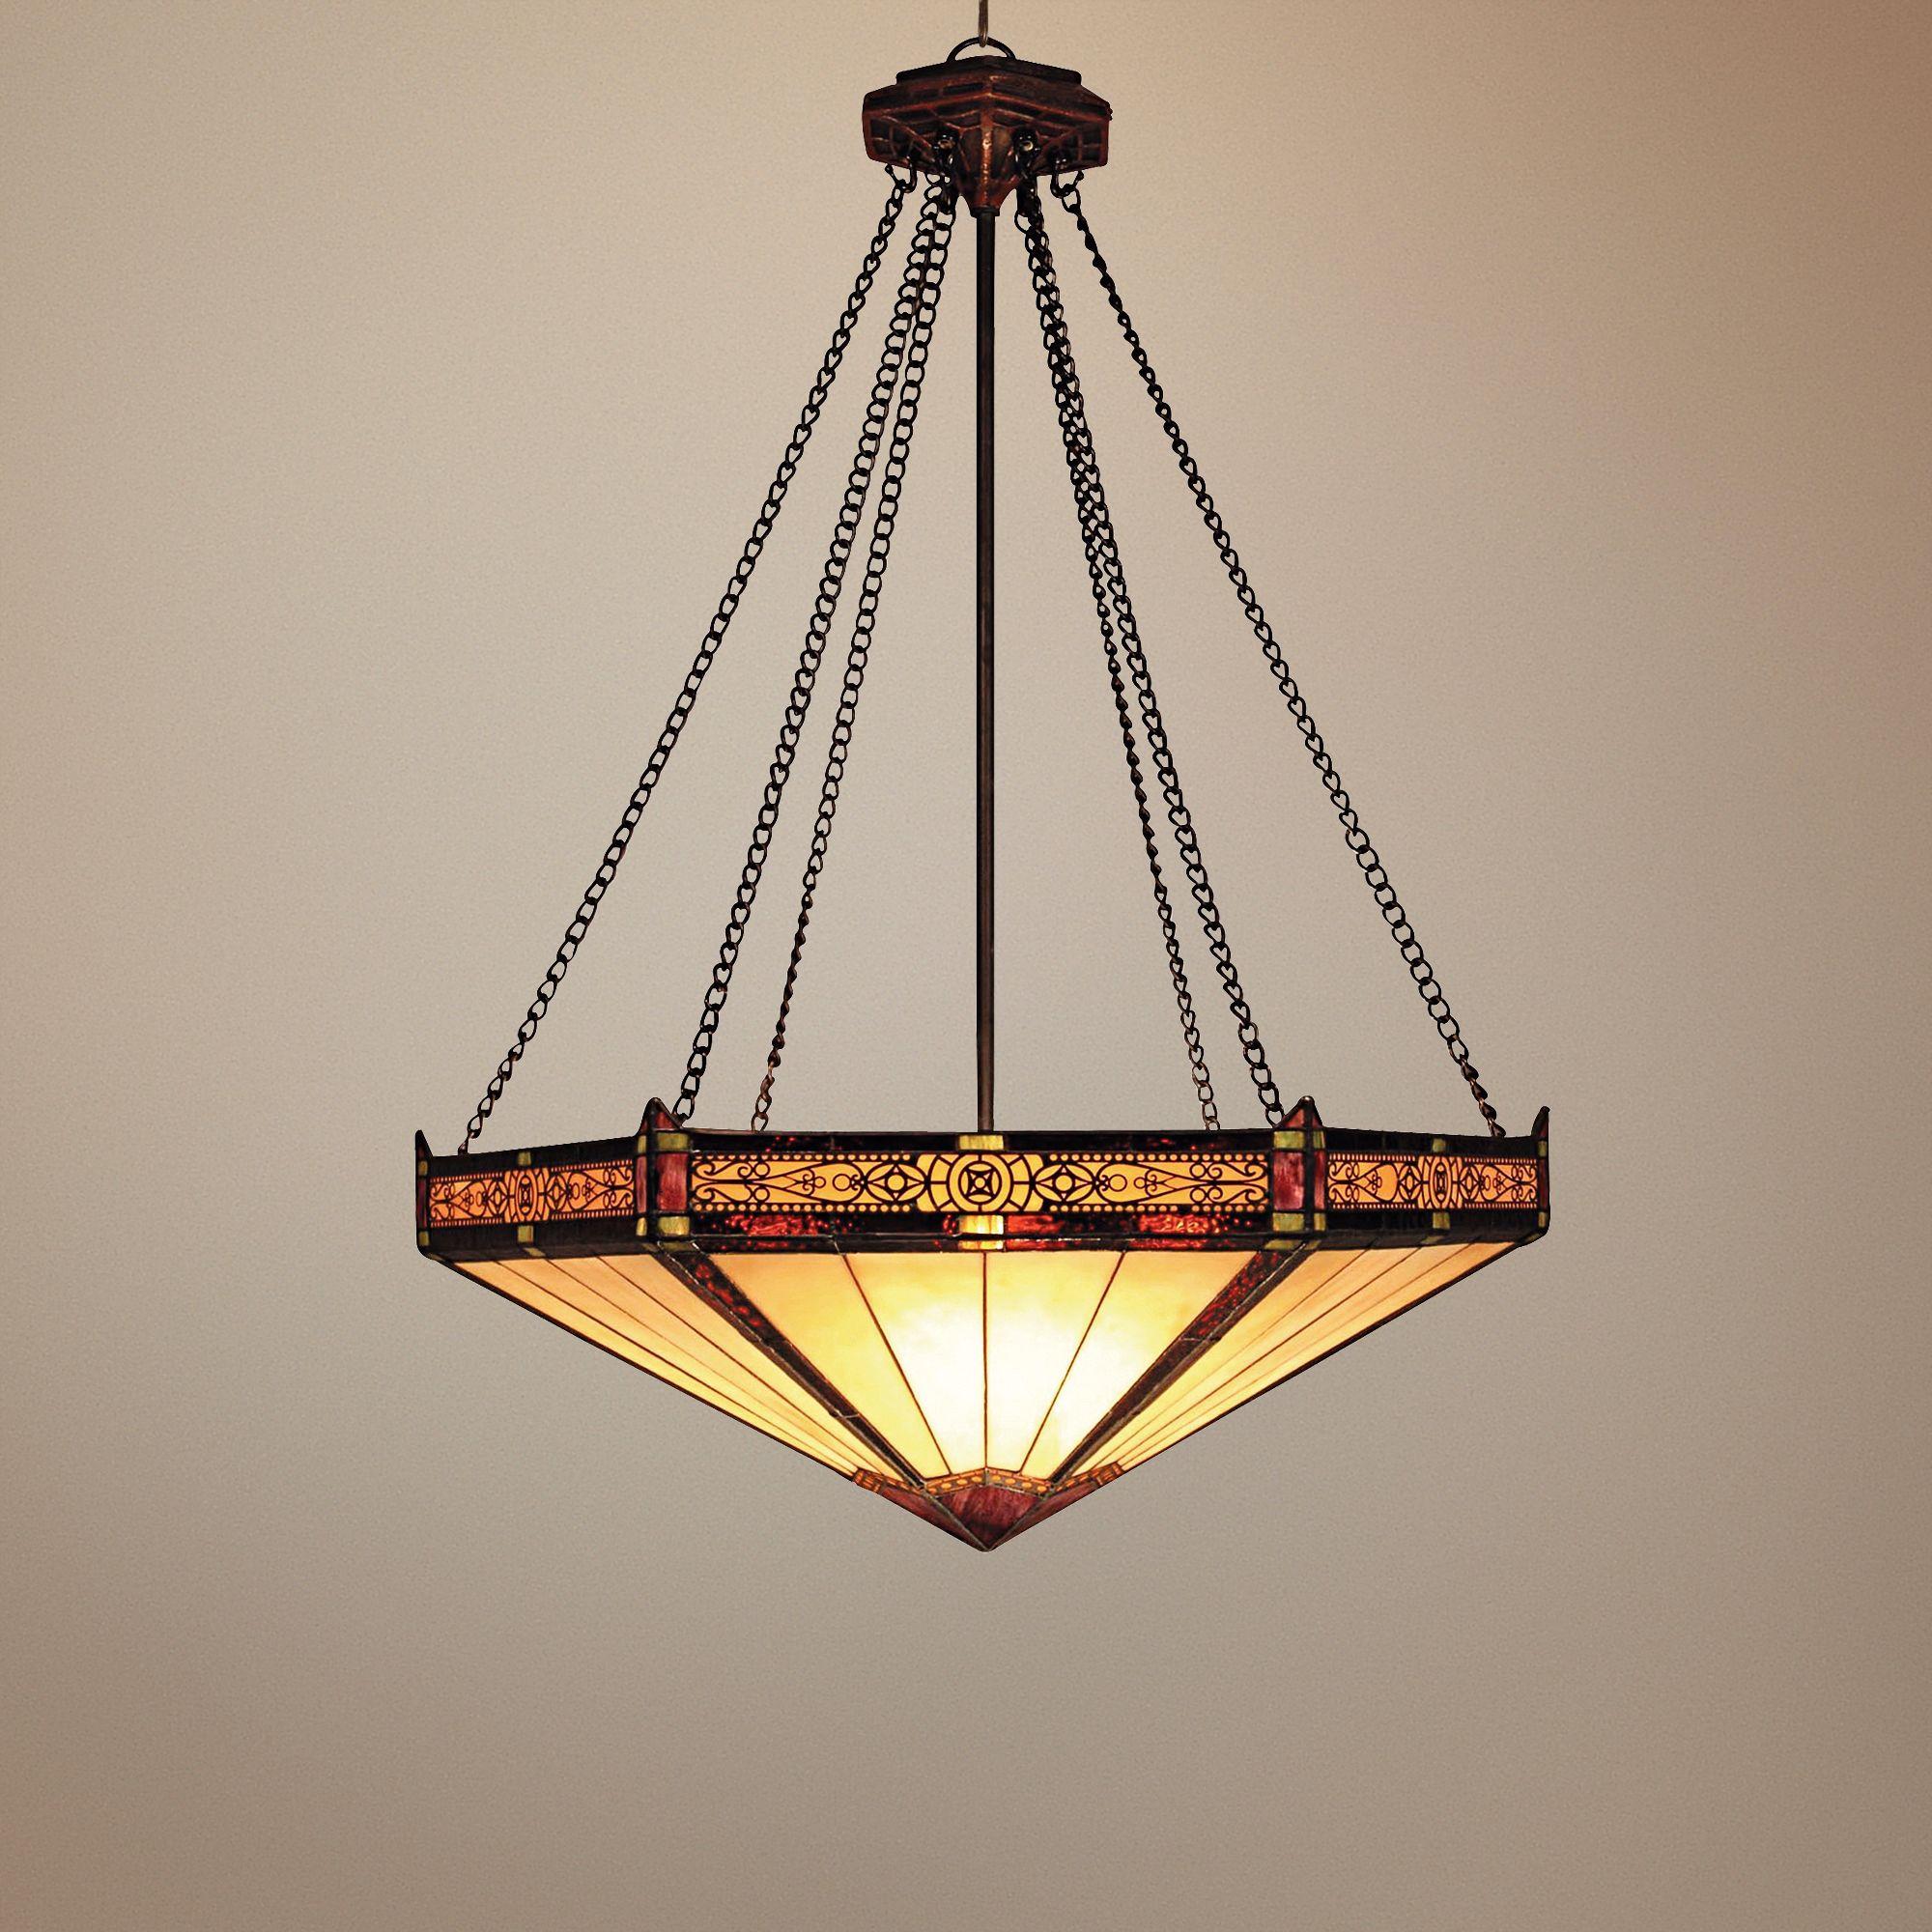 Aged Bronze Filigree Tiffany Style 3-Light Chandelier